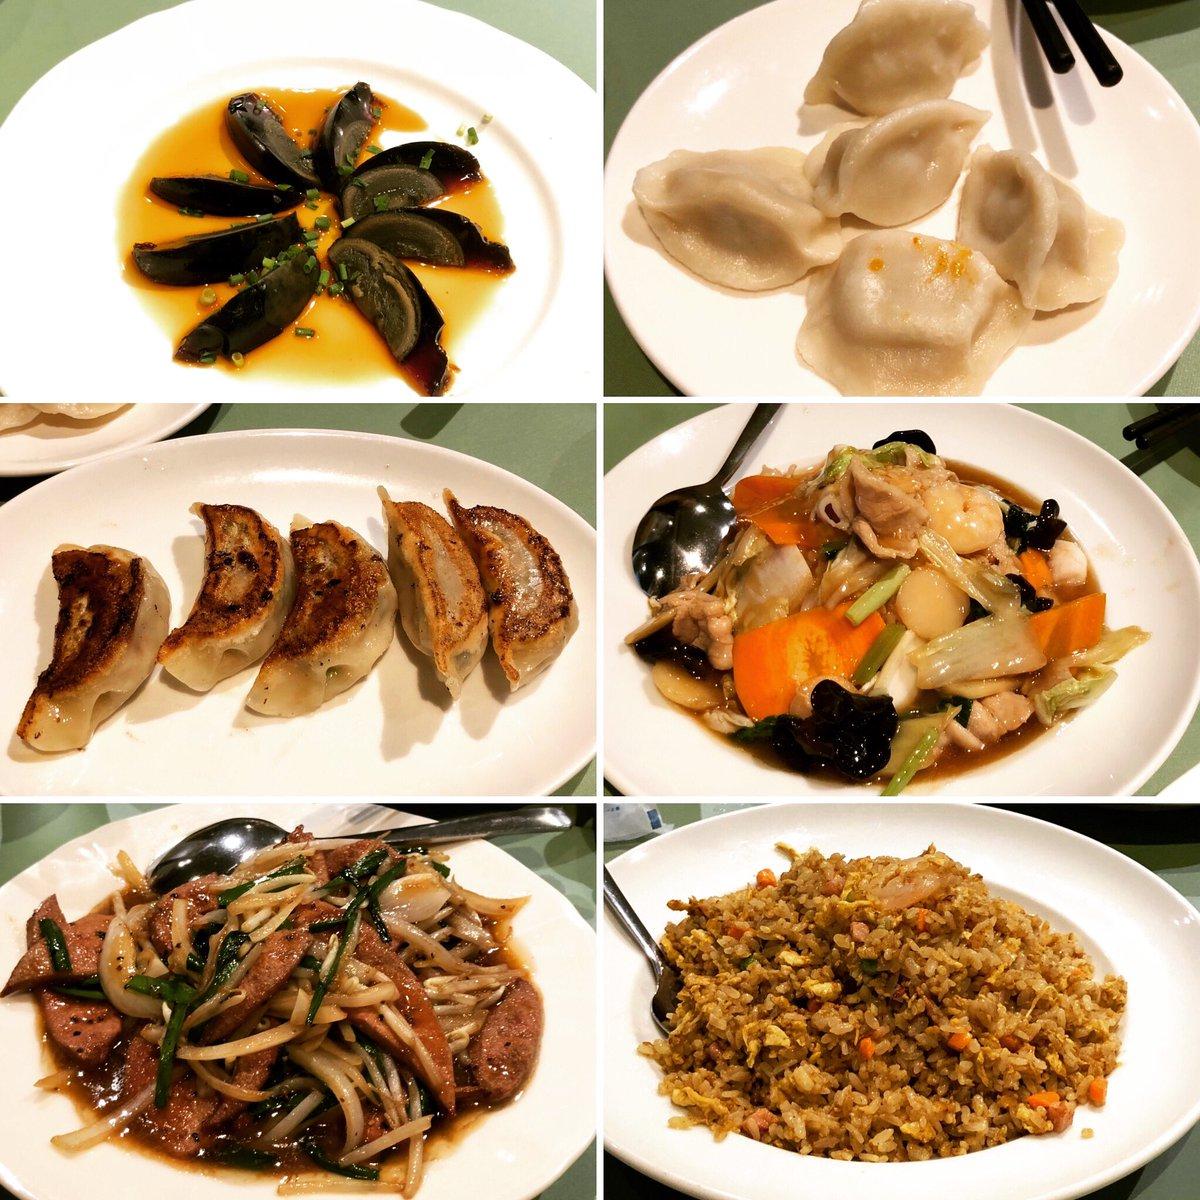 RT @tateomif: 今日の夕食は、中華です。  #Tsudanuma #津田沼 #Sansaibo #三才坊 #chinesefood #chinesecuisine #中華 #中華料理...